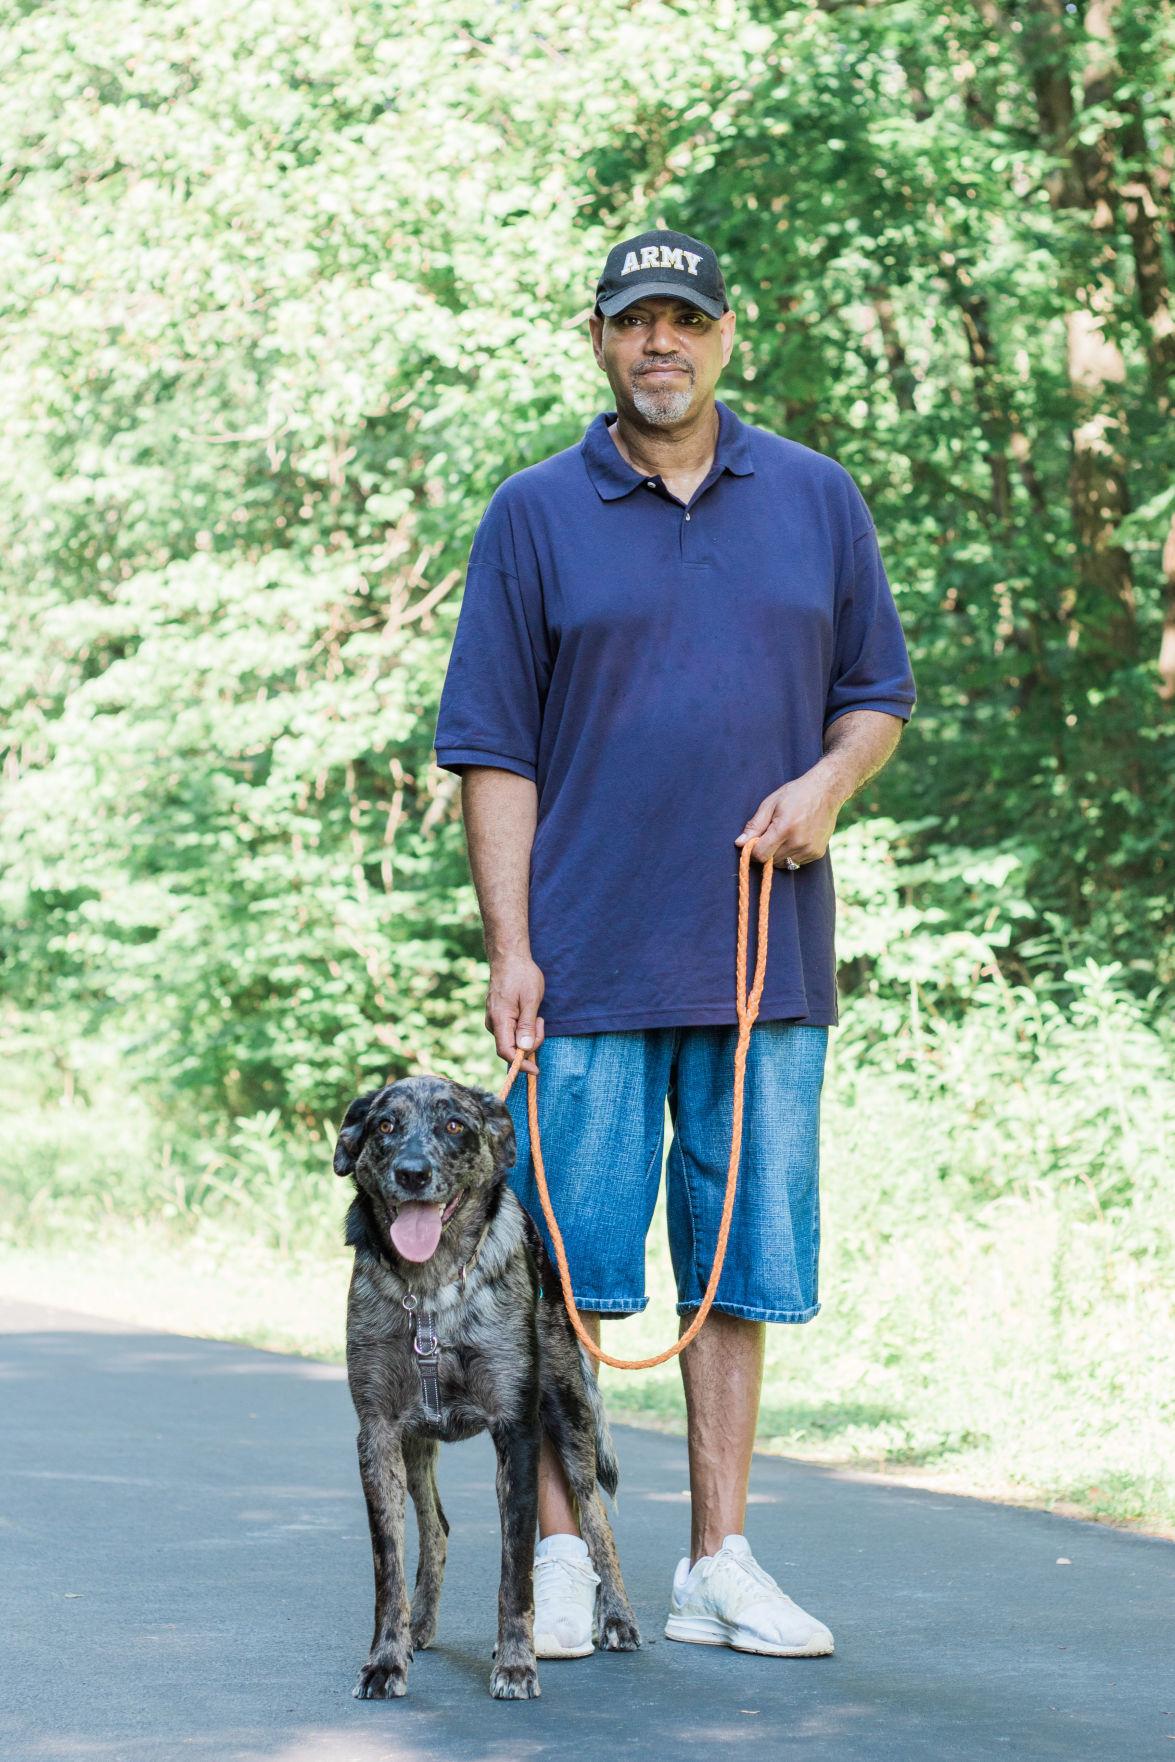 Veteran and dog